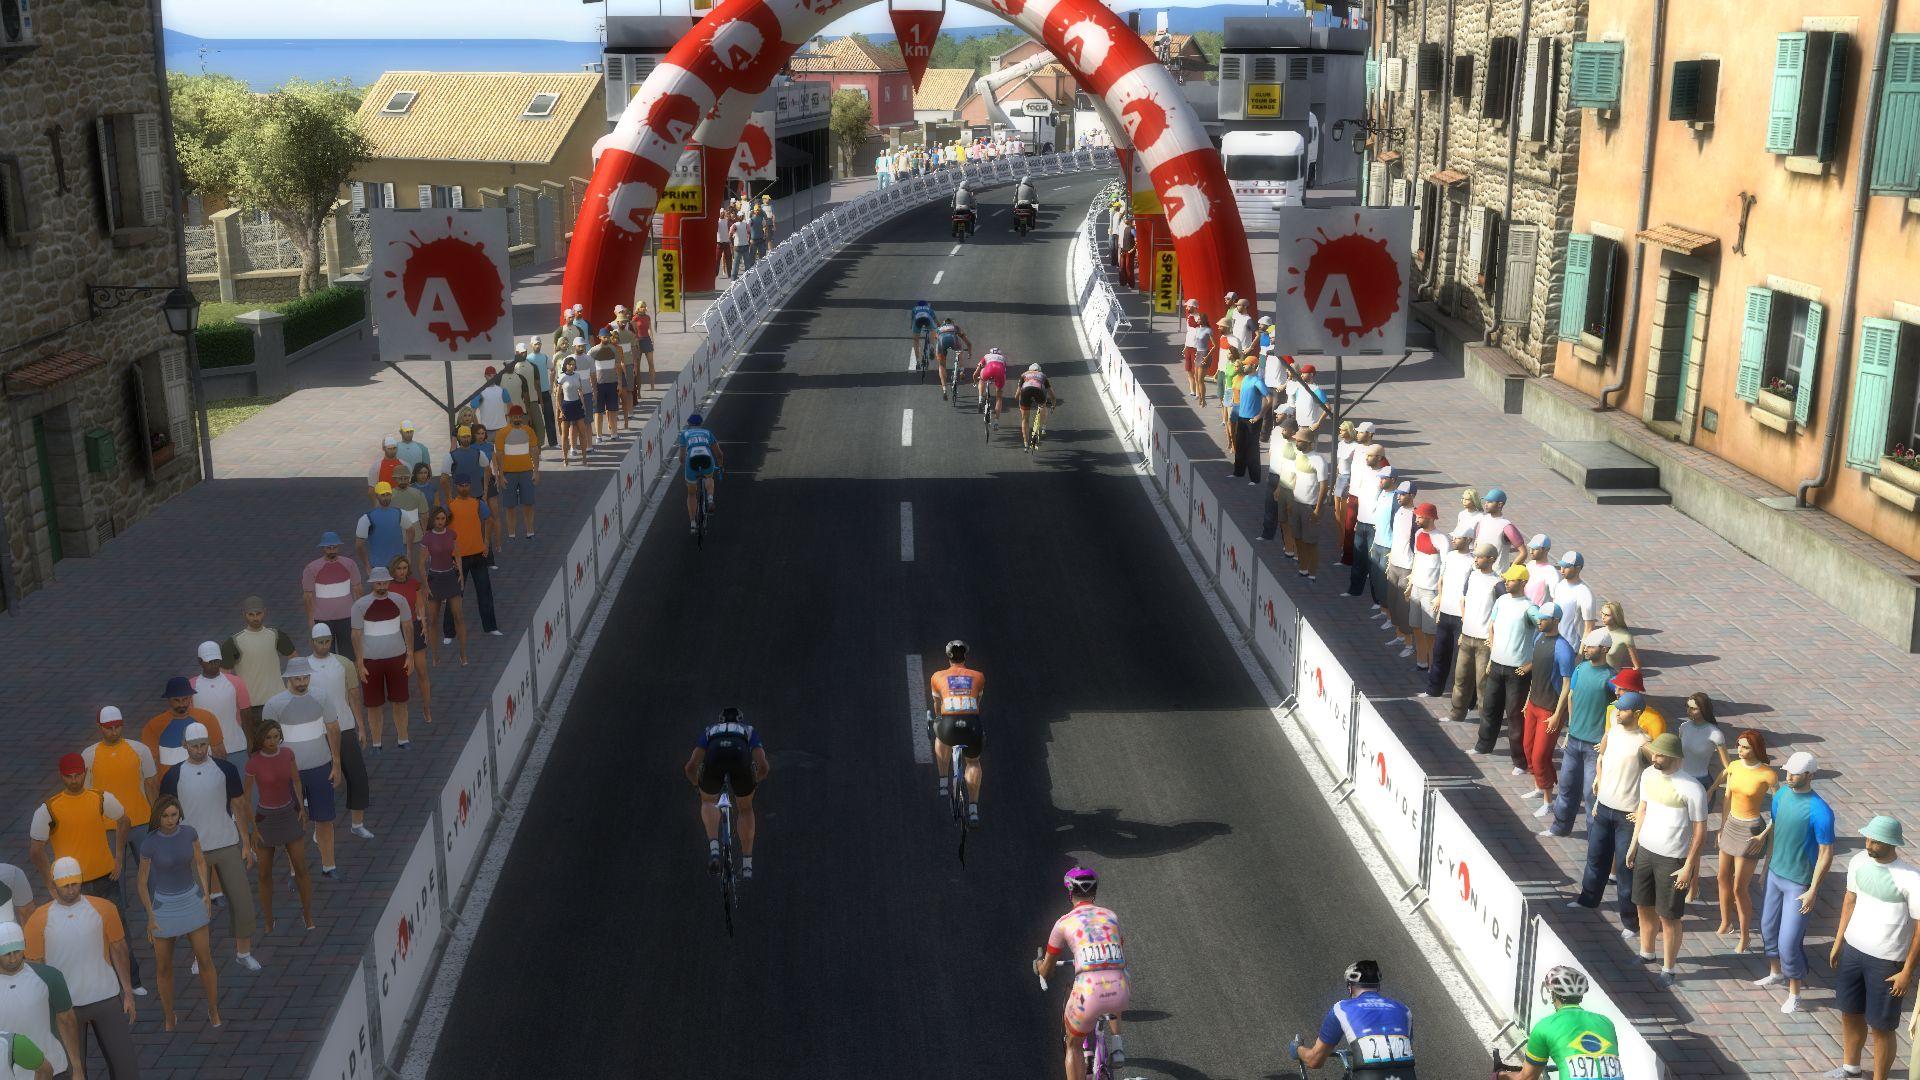 pcmdaily.com/images/mg/2019/Races/PT/Tirreno/mg19_ta_s07_21.jpg